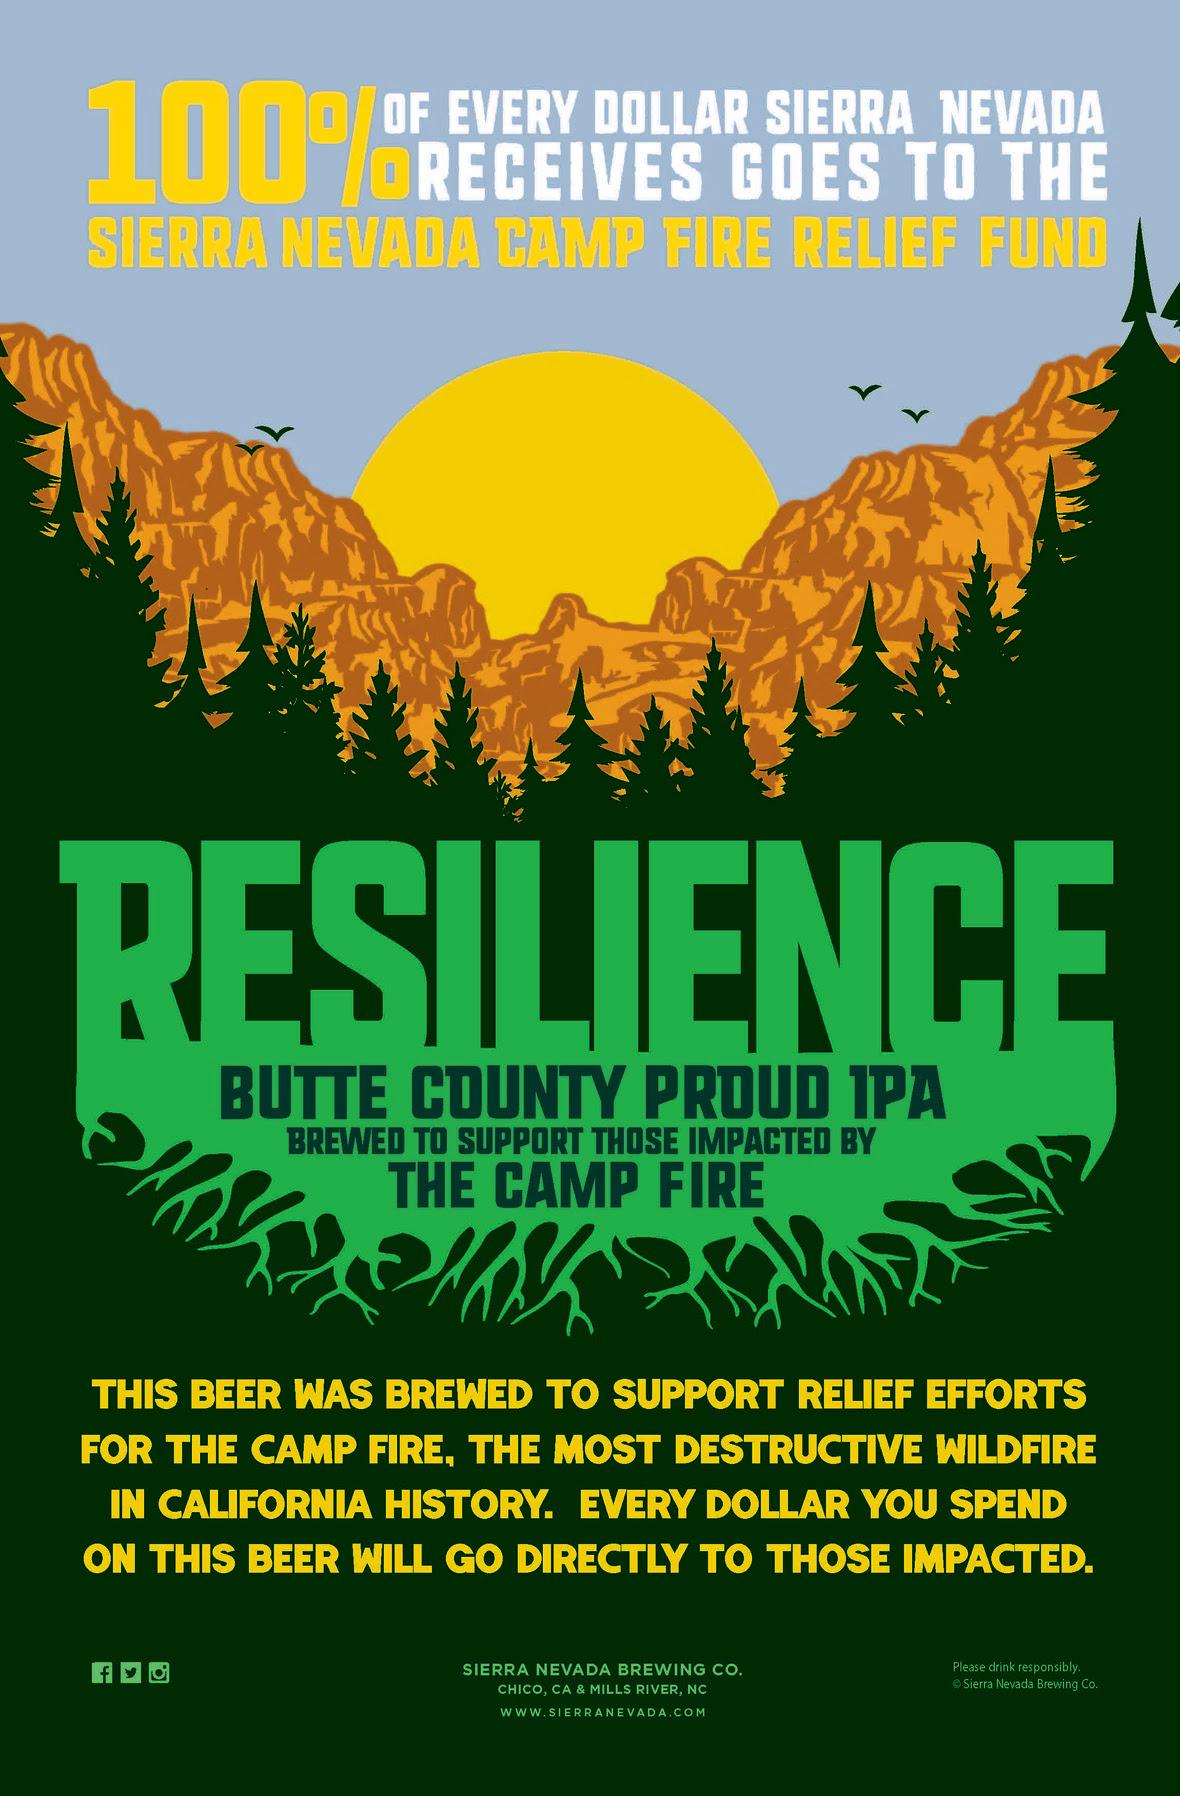 image courtesy Sierra Nevada Brewing Company and Ashland Brewing Company